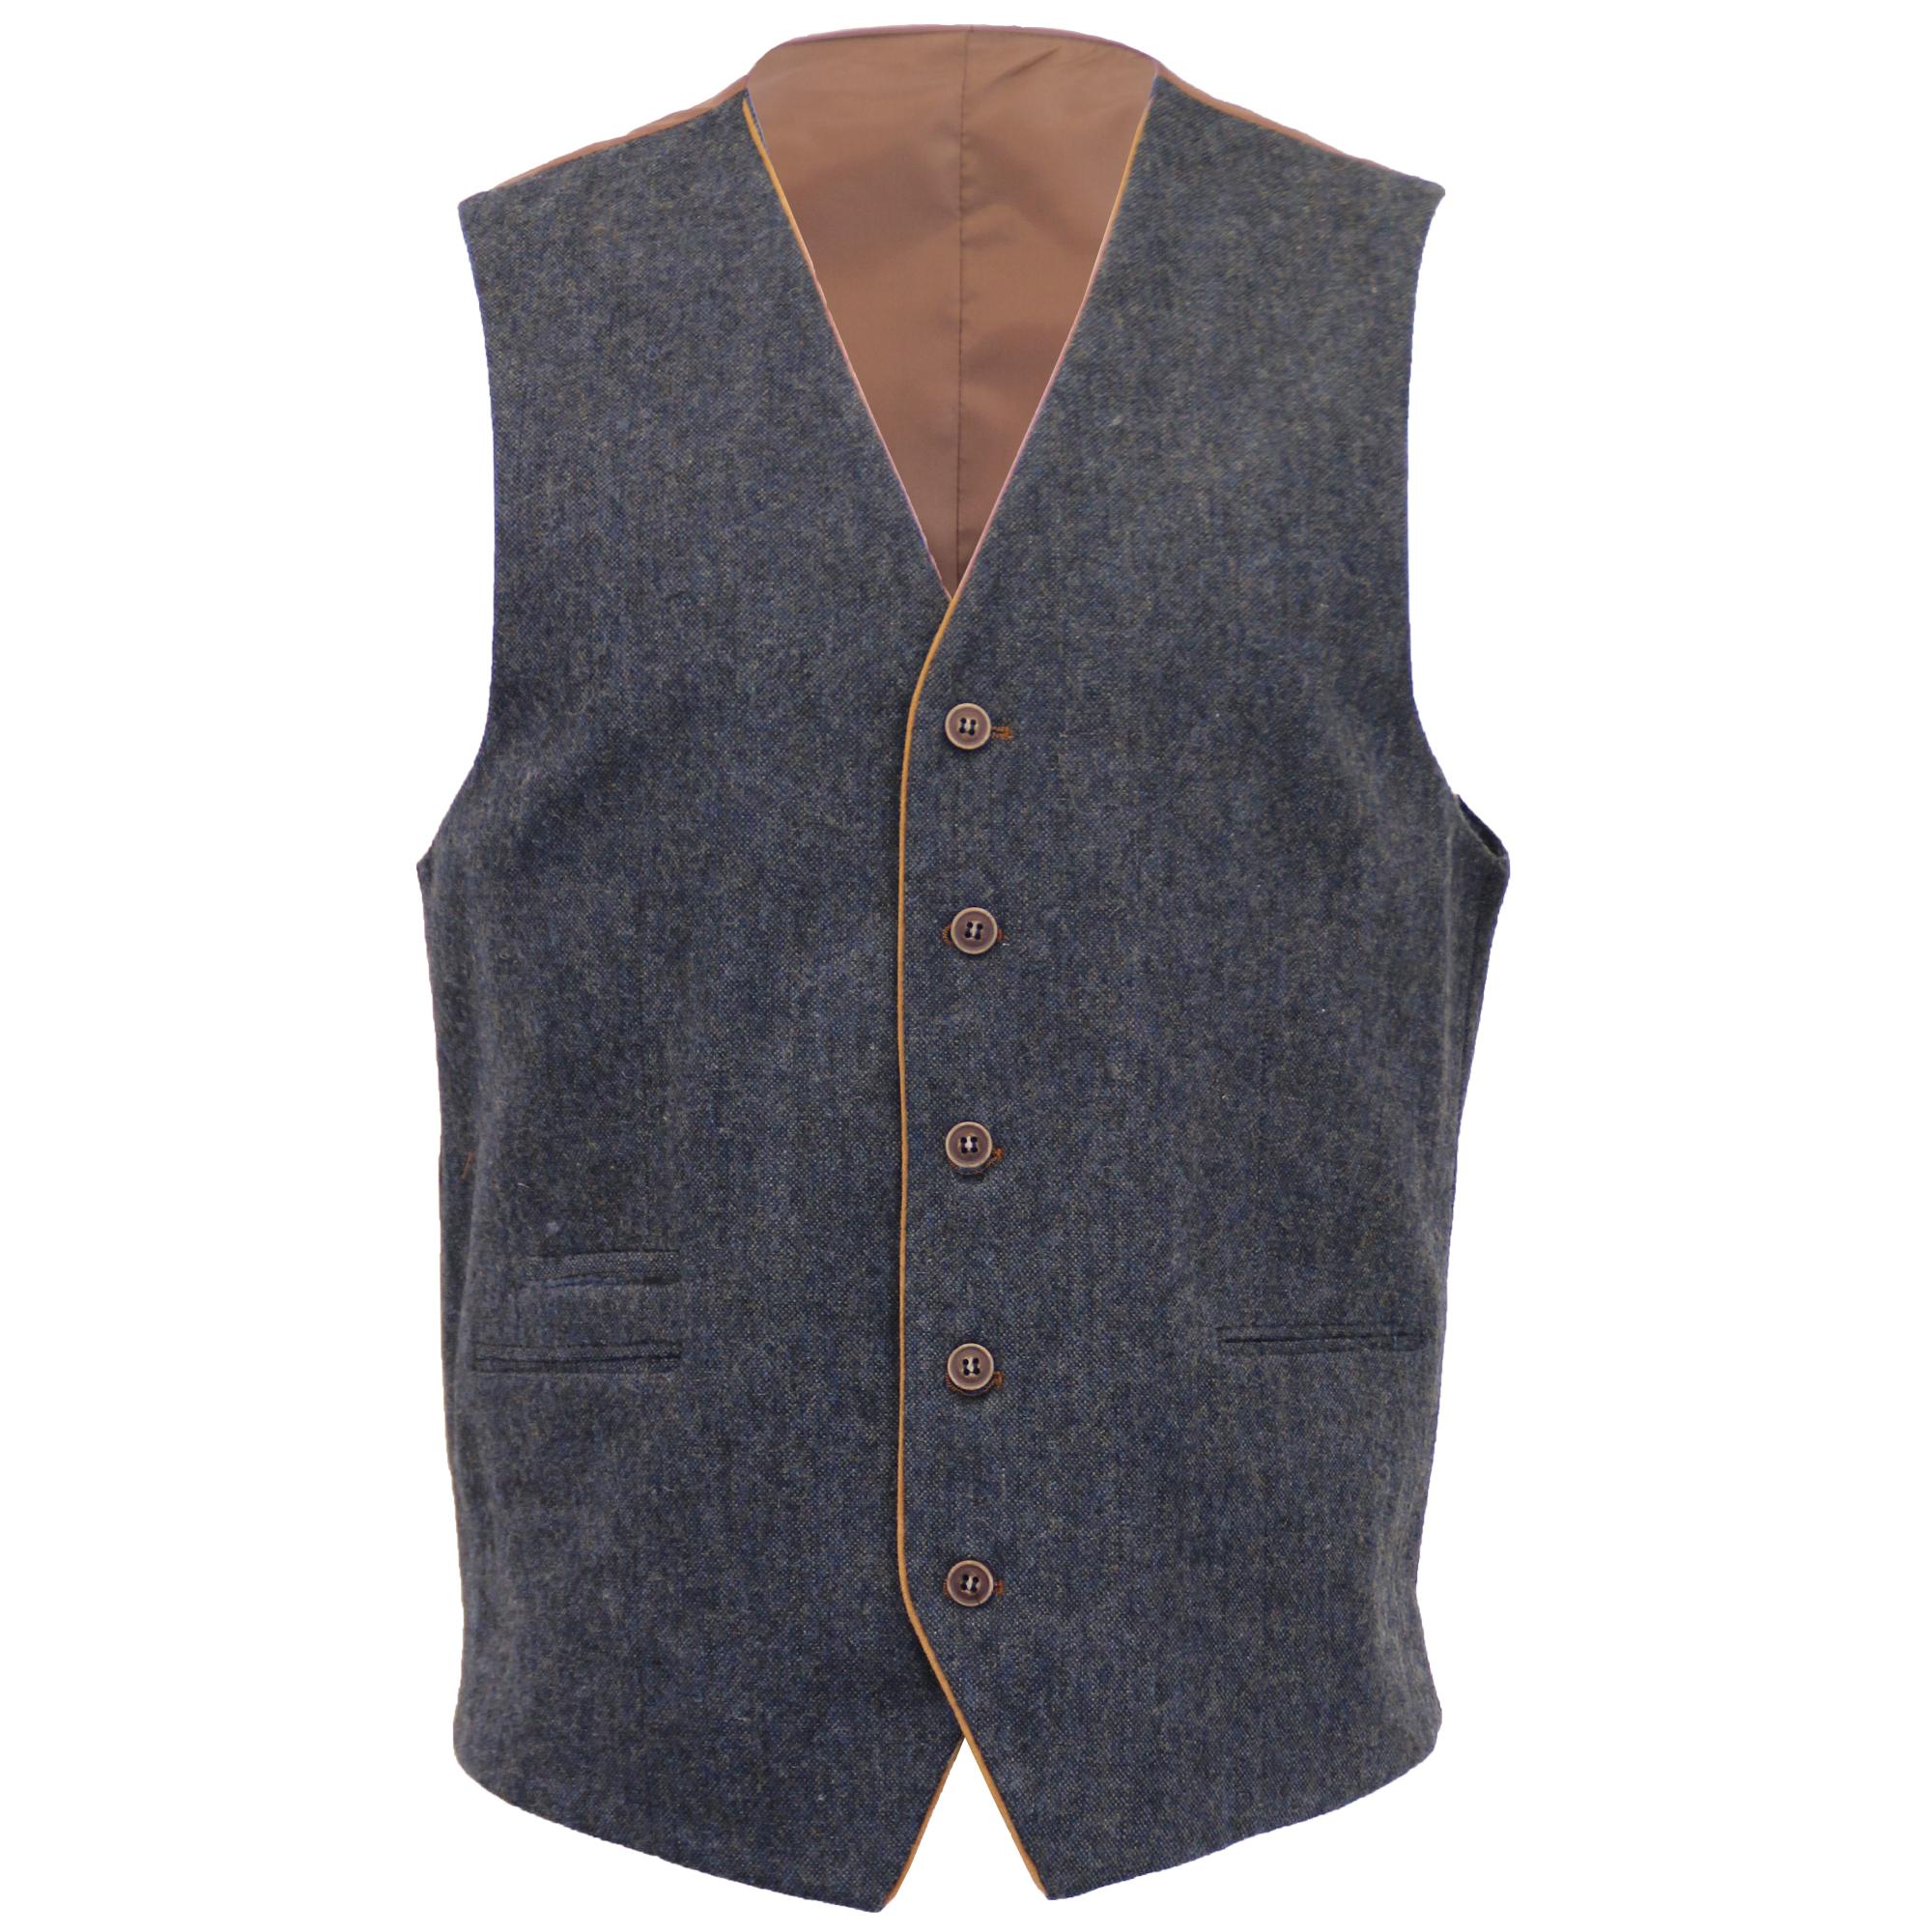 Mezcla-de-lana-para-hombre-3-piezas-trajes-mareno-Blazer-Chaqueta-pantalones-chaleco-Fiesta-Formal miniatura 12